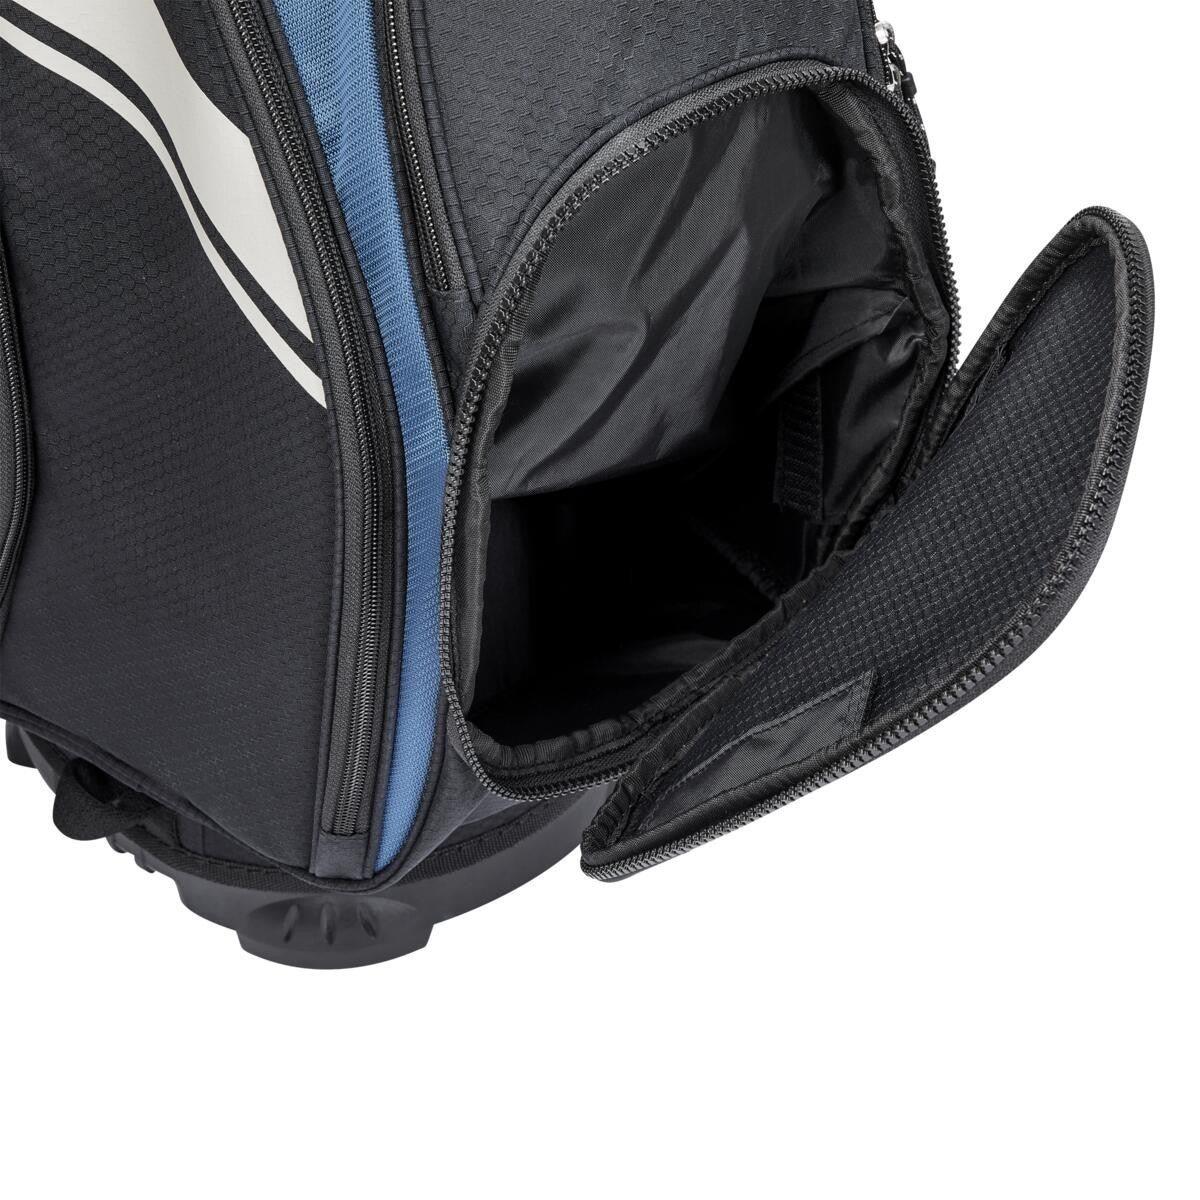 Wilson Staff golftas Exo II Cart Bag zwart-groen met dames purse